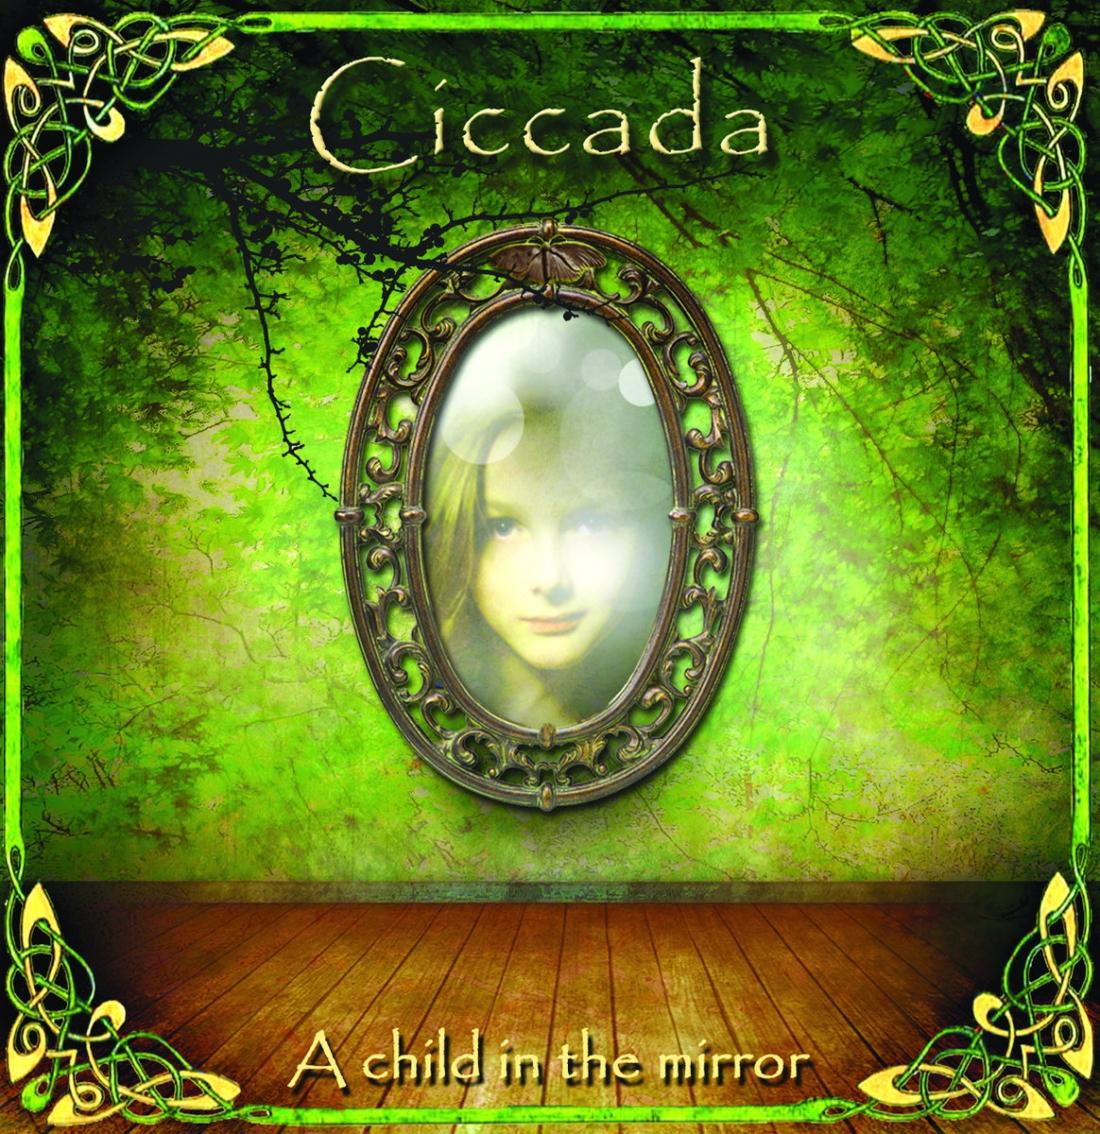 netherland dwarf のコラム『rabbit on the run』 第27回  CICCADA / A Child In The Mirror (Greece / 2010)